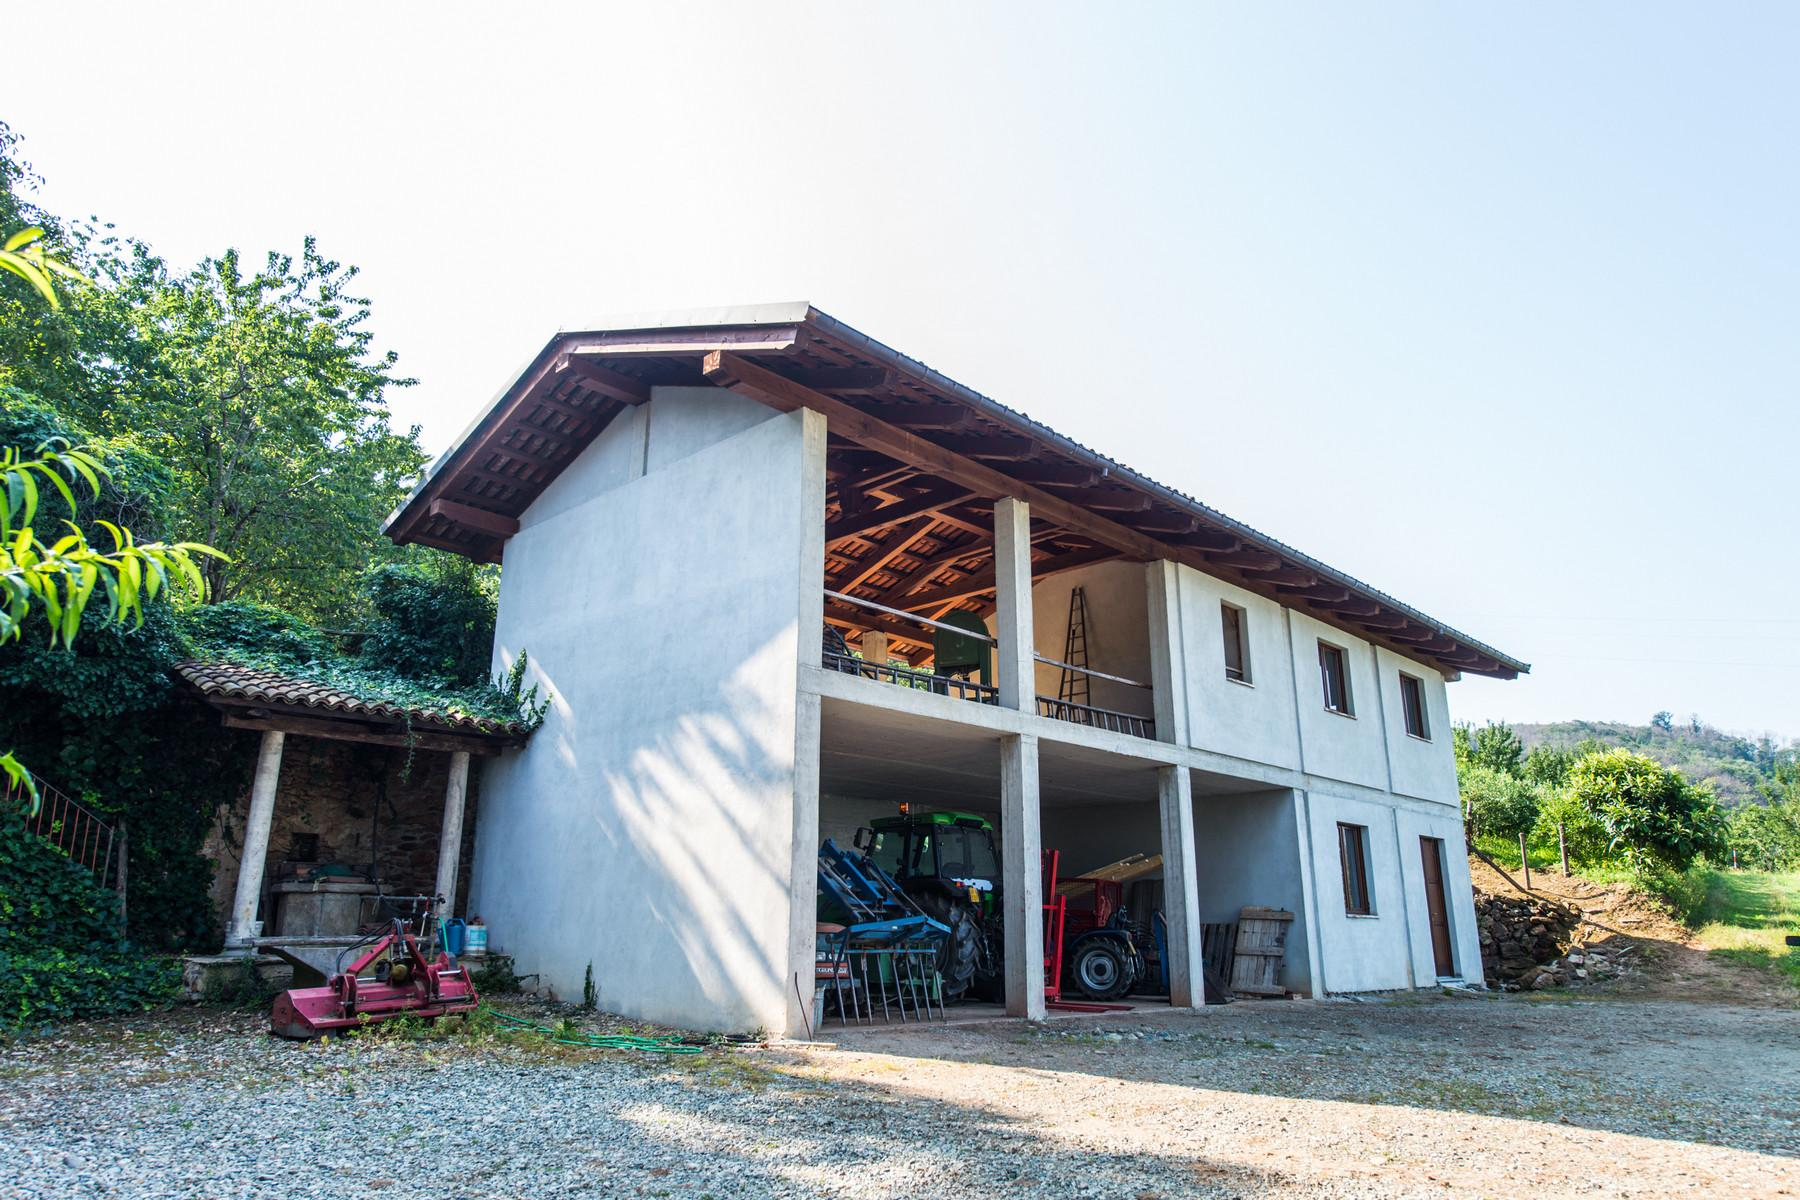 Splendid villa with winery in Piedmont - 27